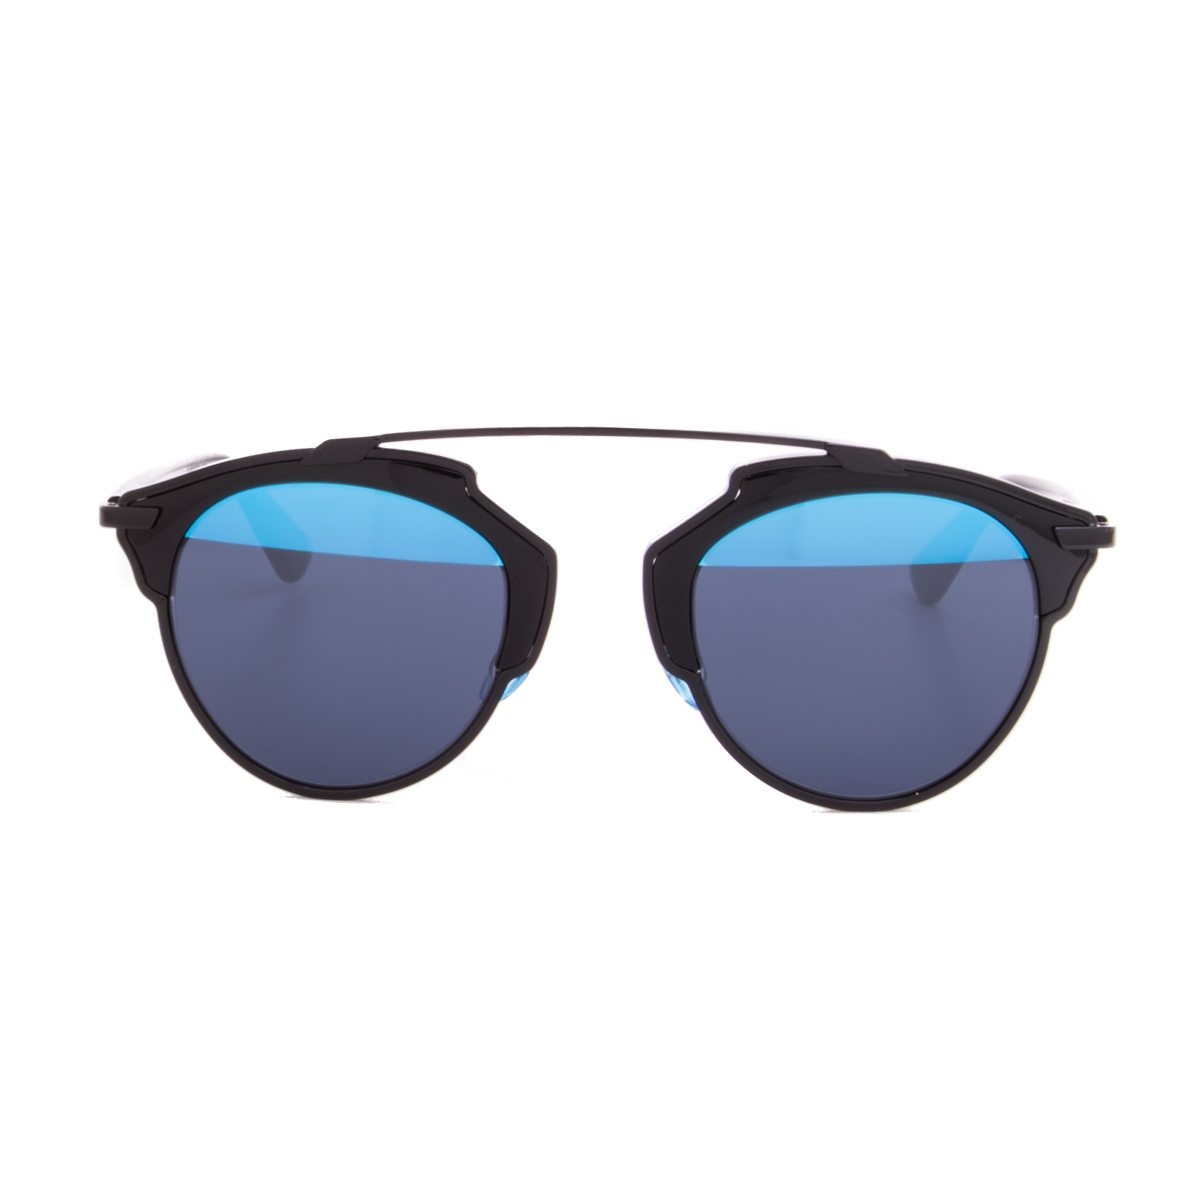 b5a9b96d6d8 Christian Dior Sunglasses Dior So Real B0YY0 Black Frame   Blue Mirrored  Lens